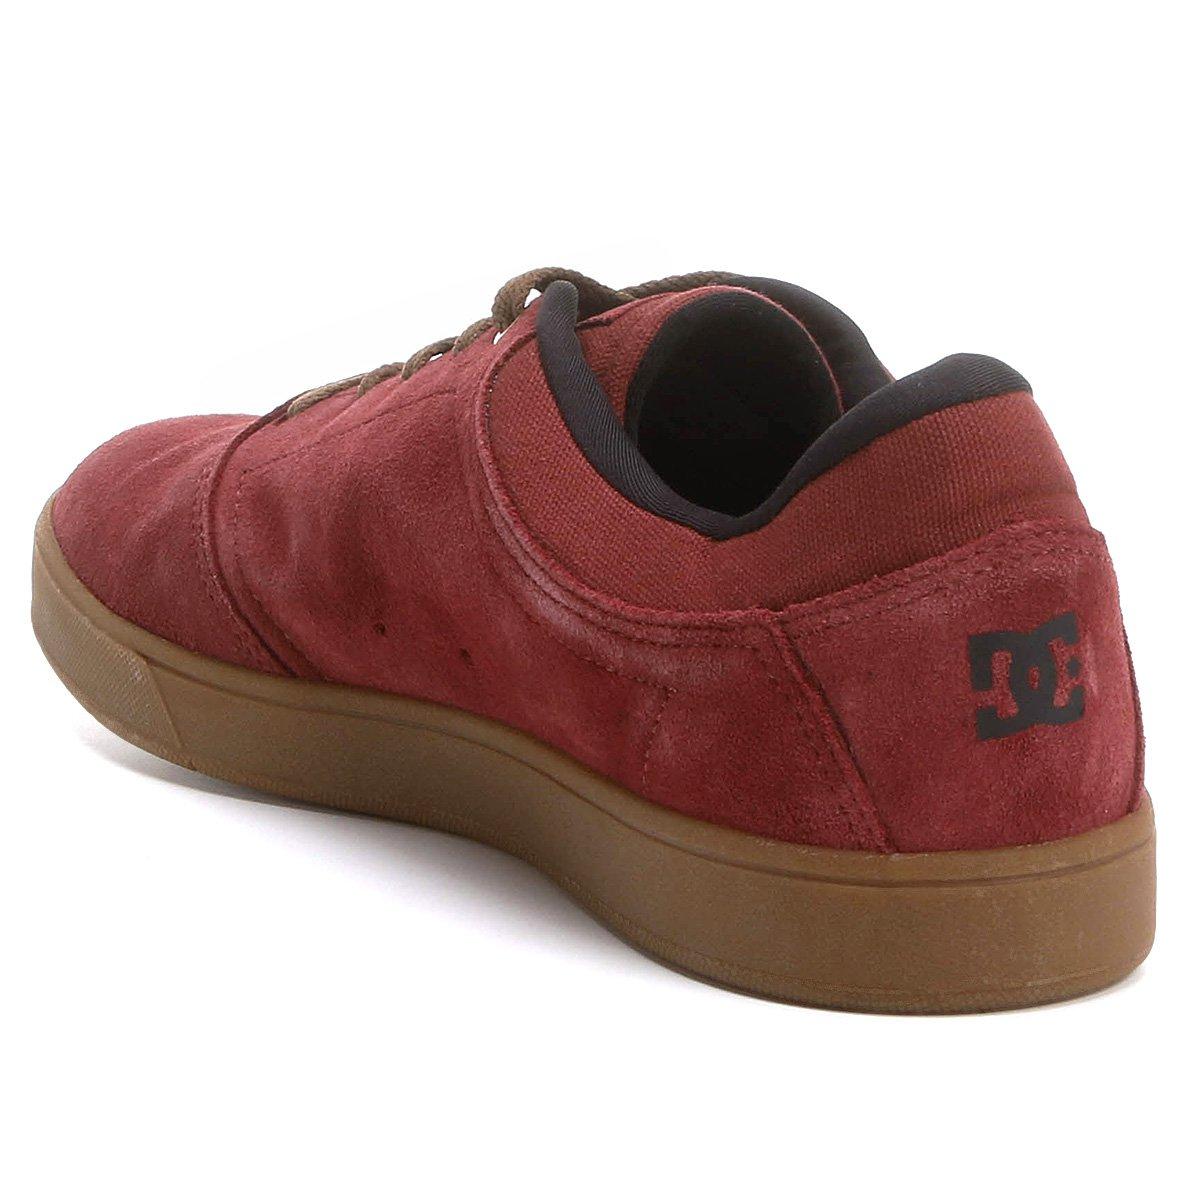 Tênis Dc Shoes Crisis LA Masculino - Bordô - Compre Agora  4033011673f1a